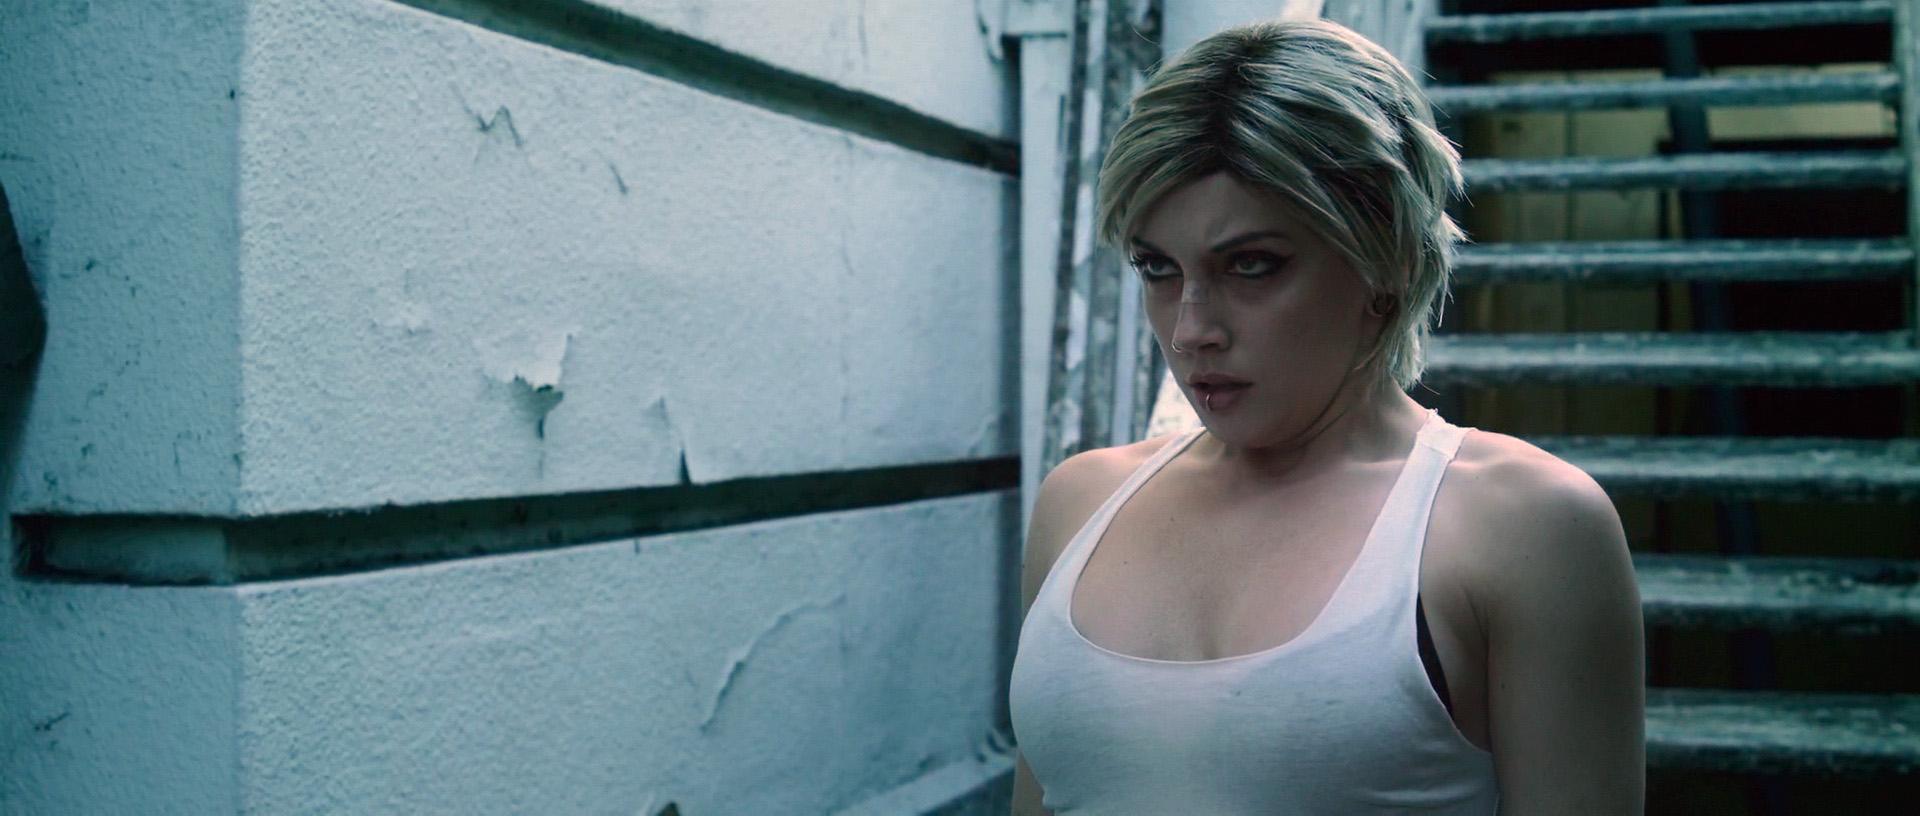 Sara varone boob